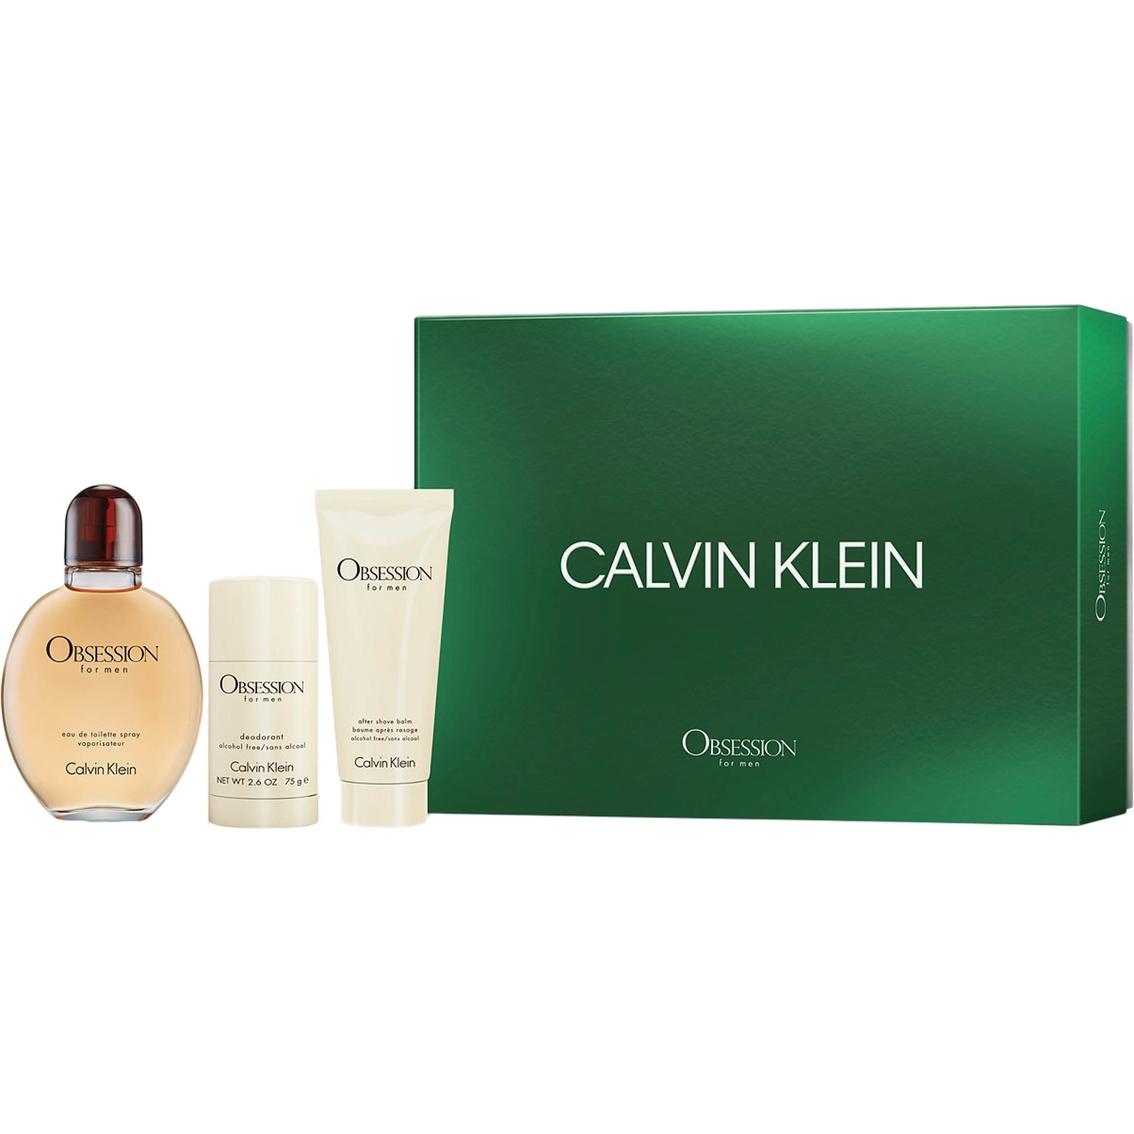 8e3b2c3bd4a1 Calvin Klein Obsession For Men 3 Pc. Gift Set